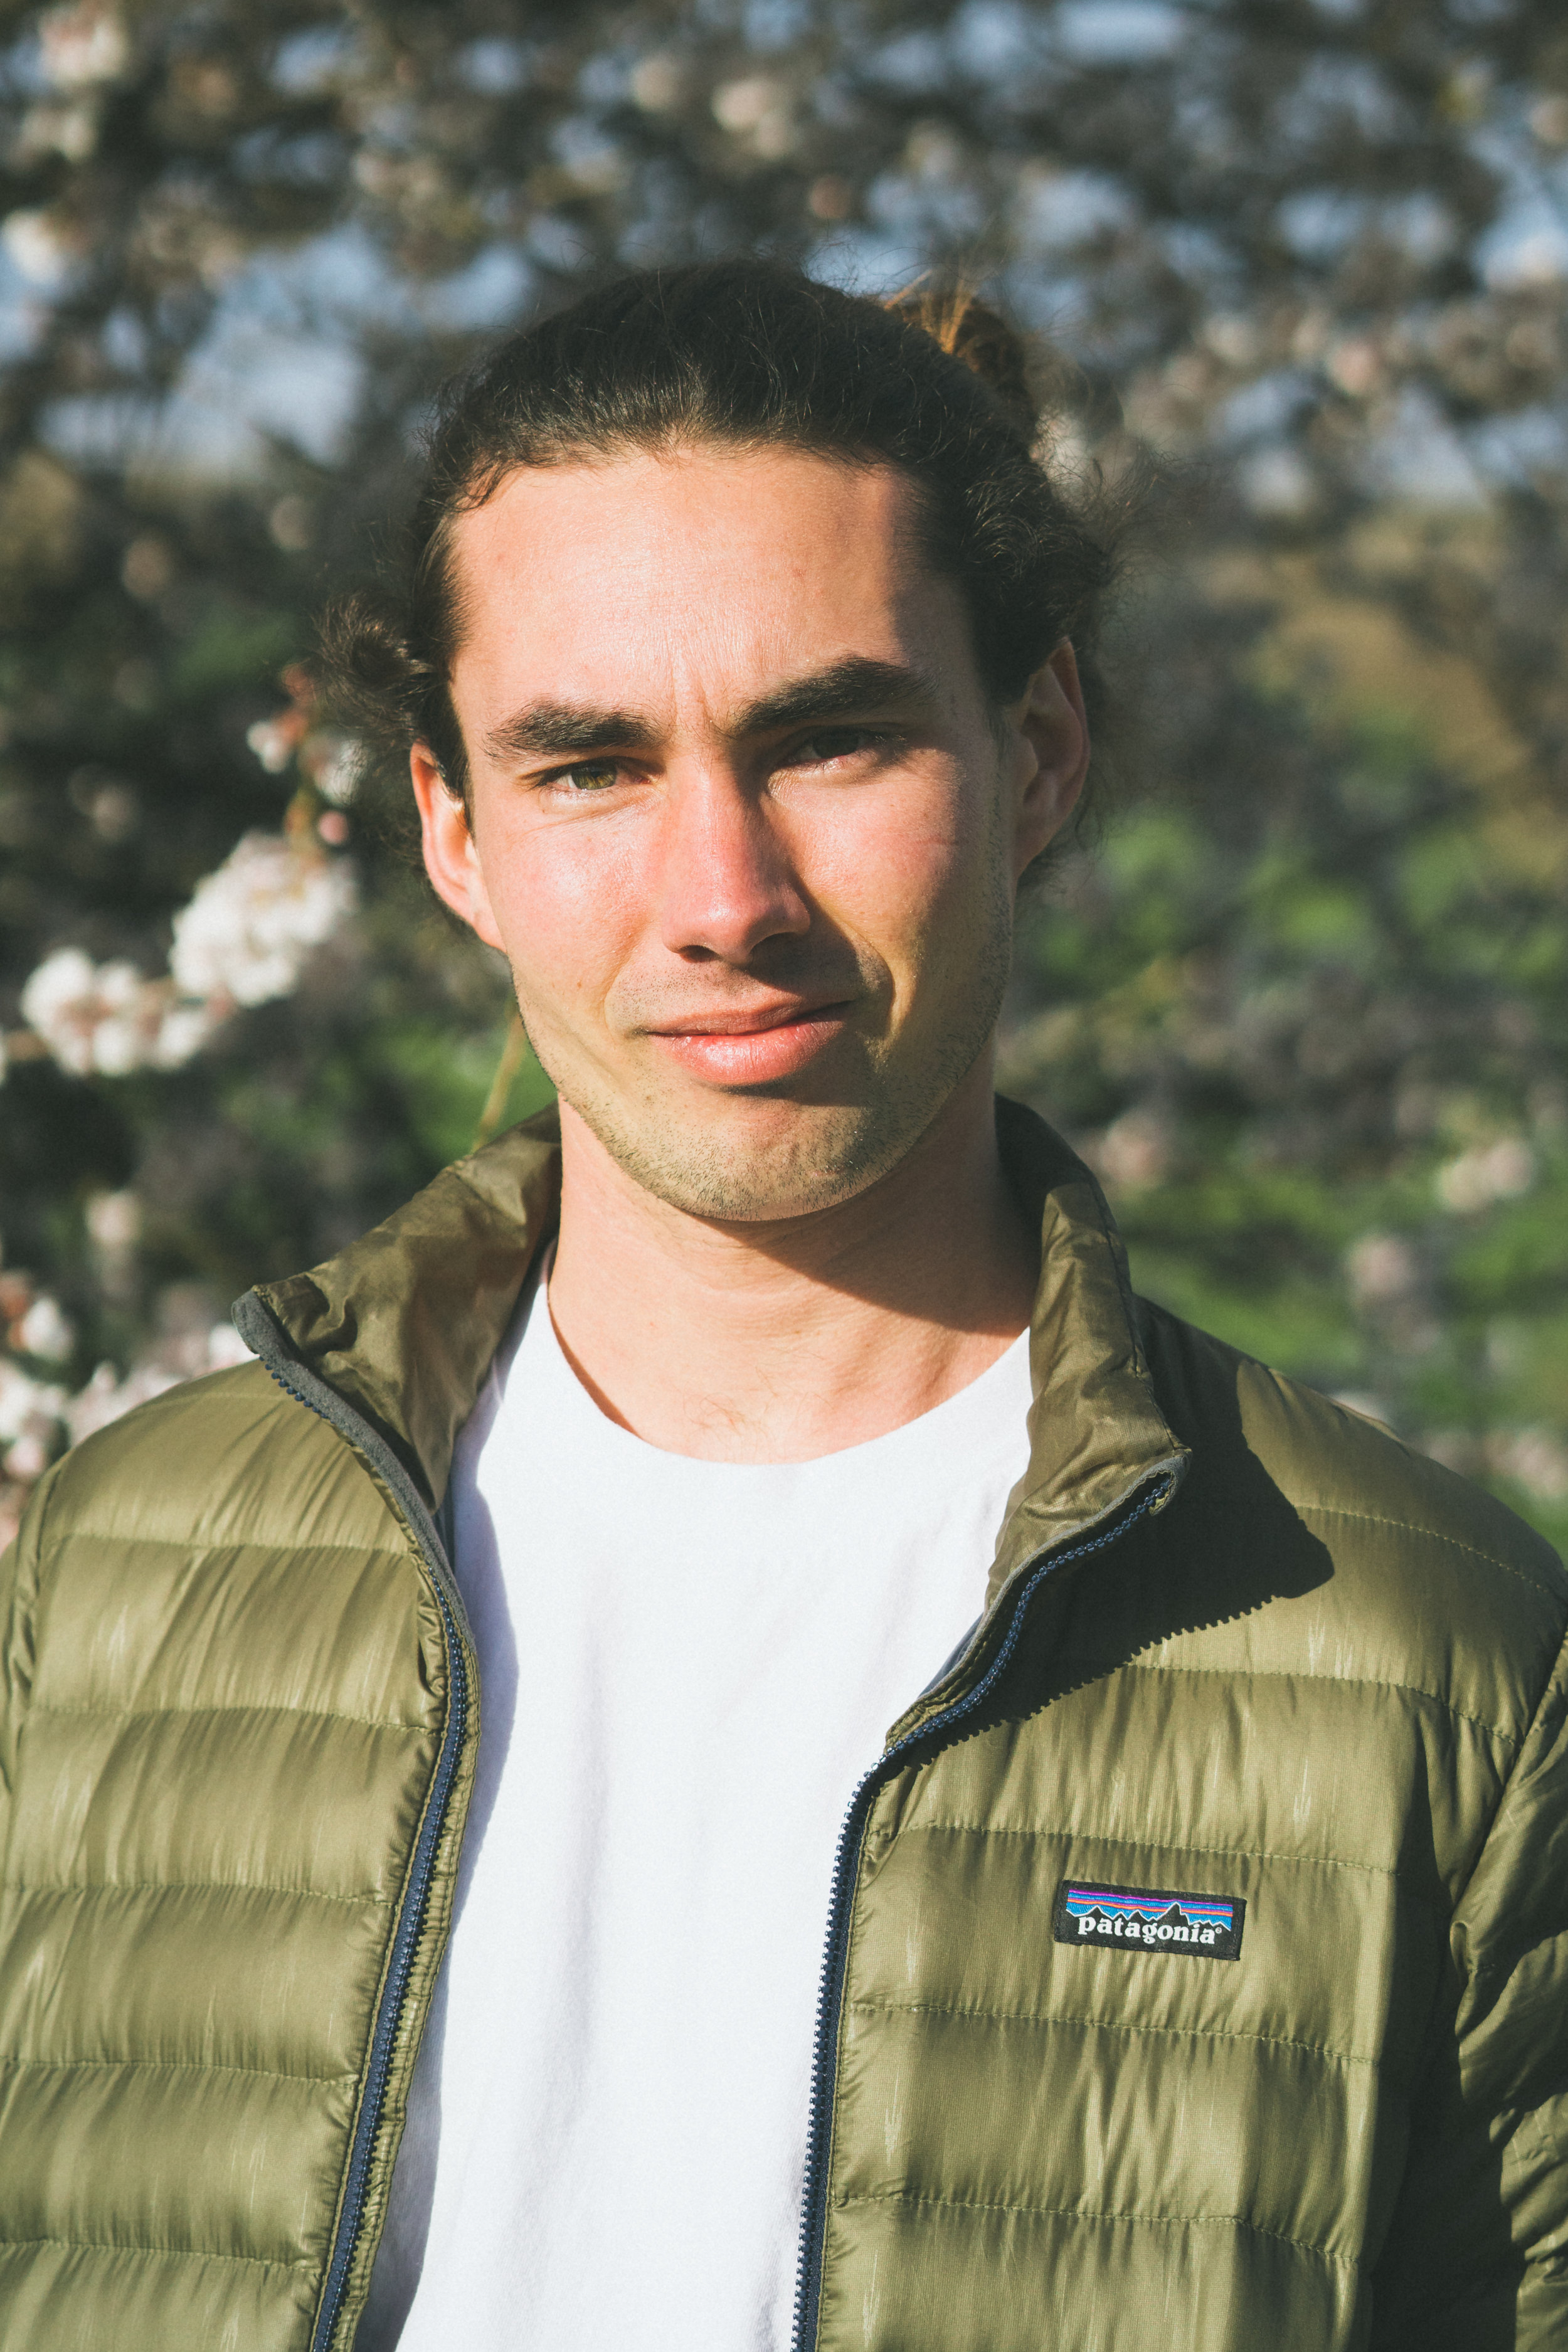 Ben Morrison, Drums and Vocals